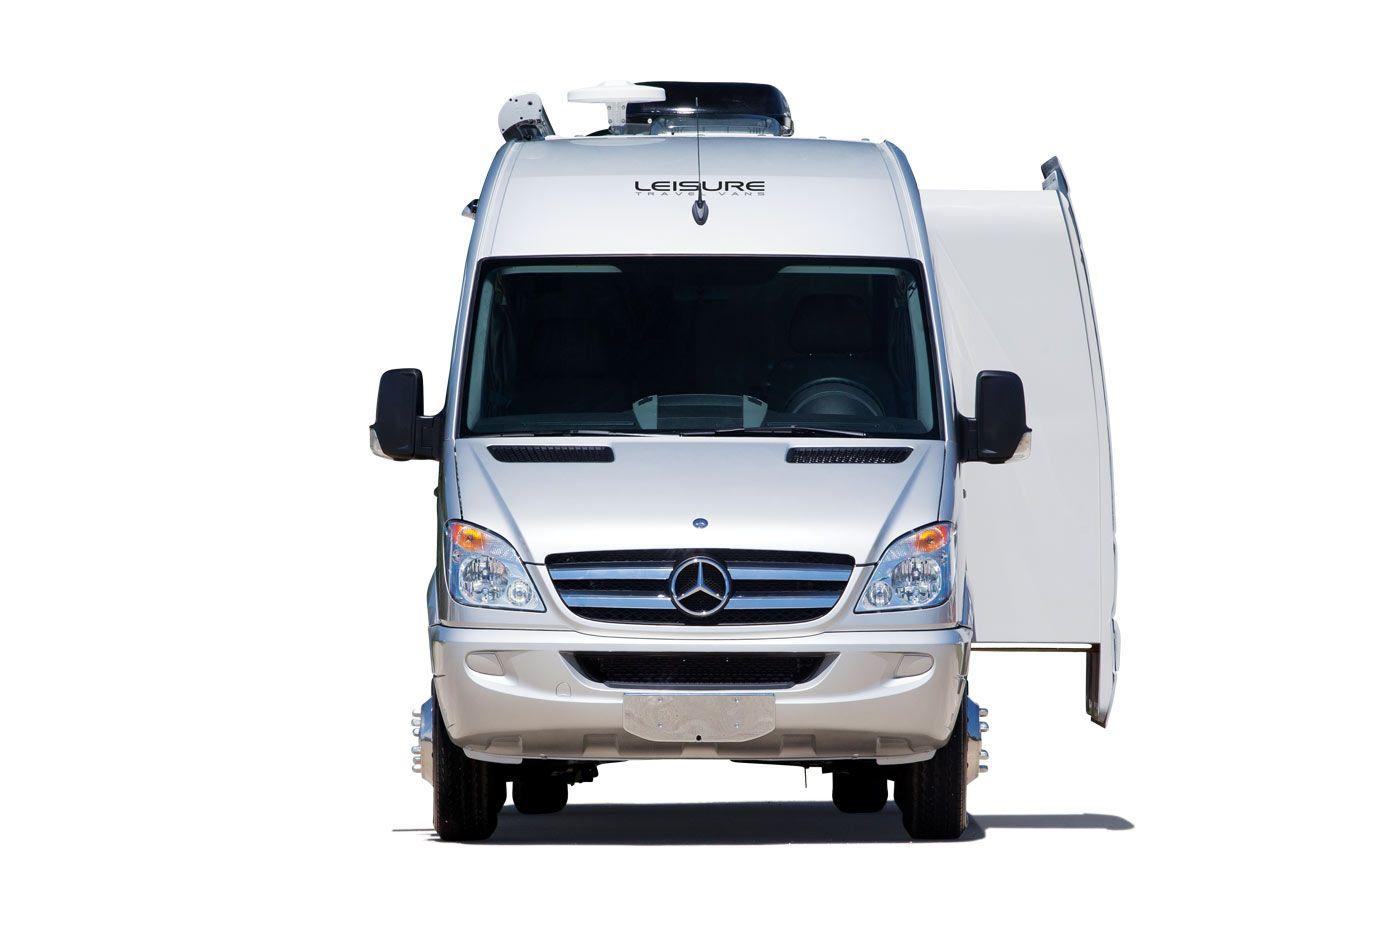 Leisure Travel Vans For Rent >> Free Spirit Past Models Glamping Campers Leisure Travel Vans